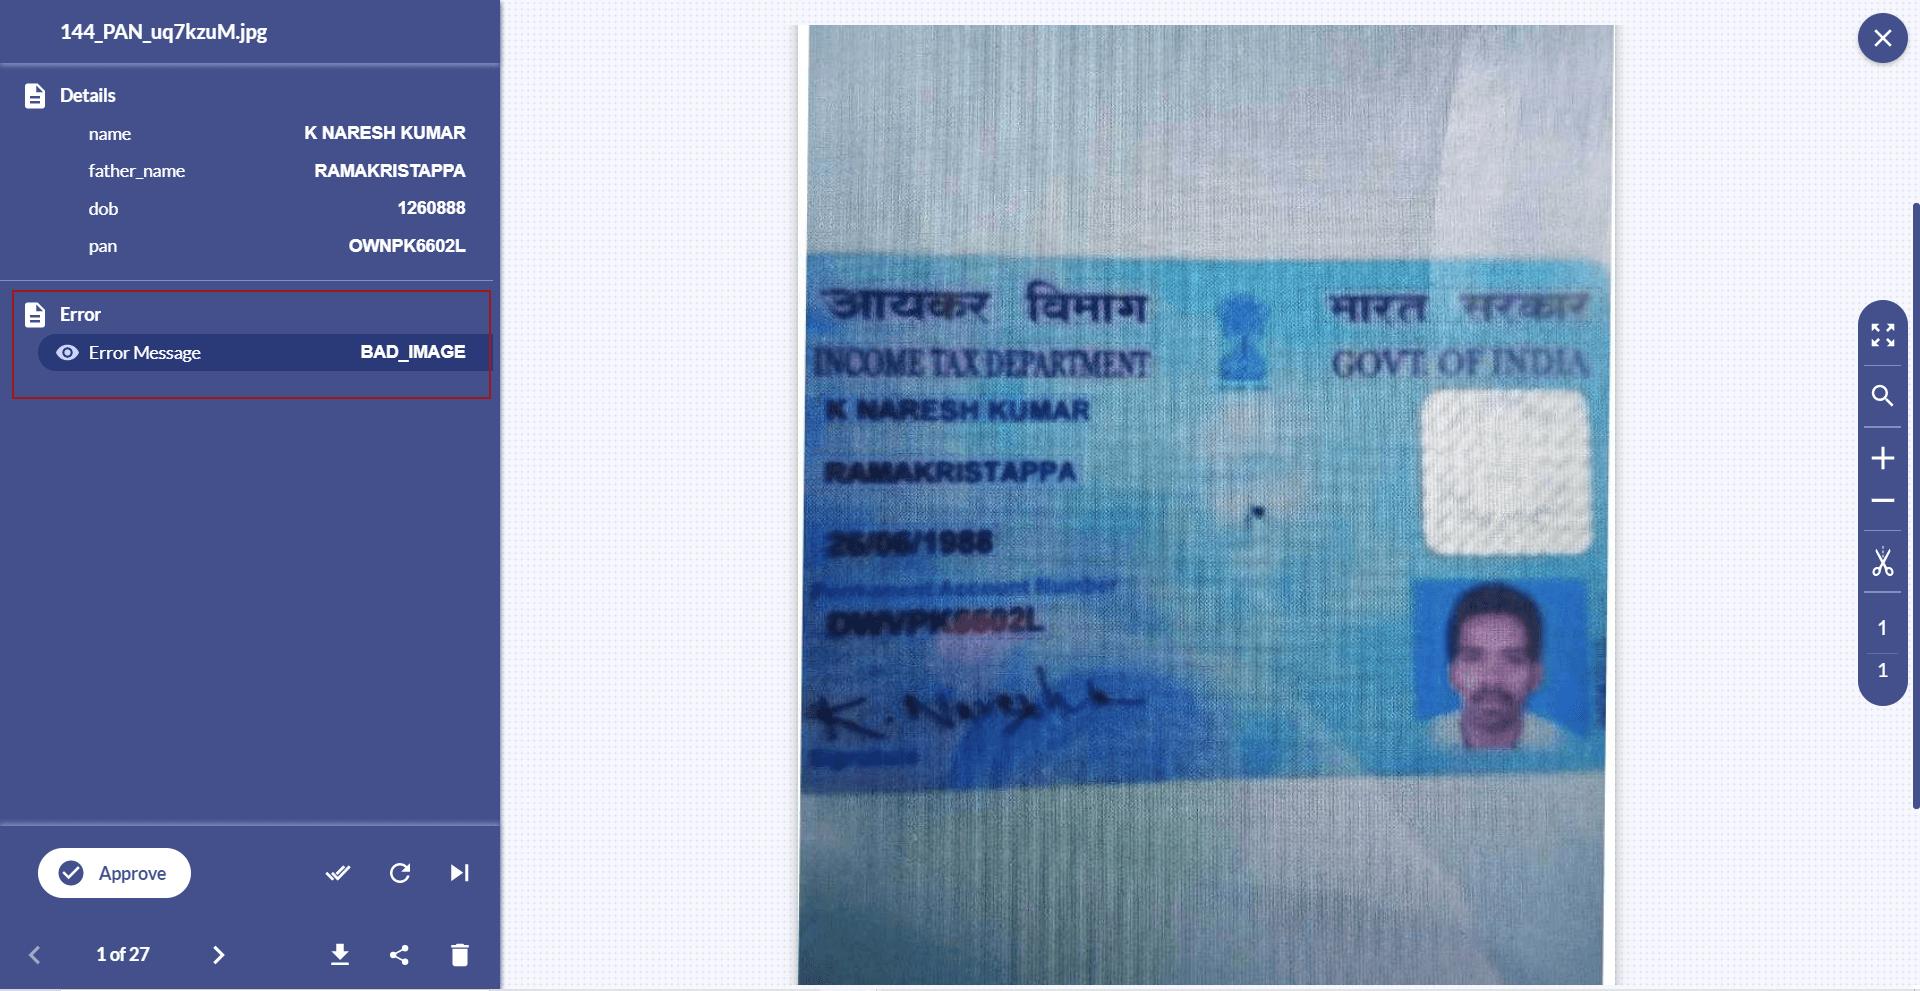 PAN card bad image error